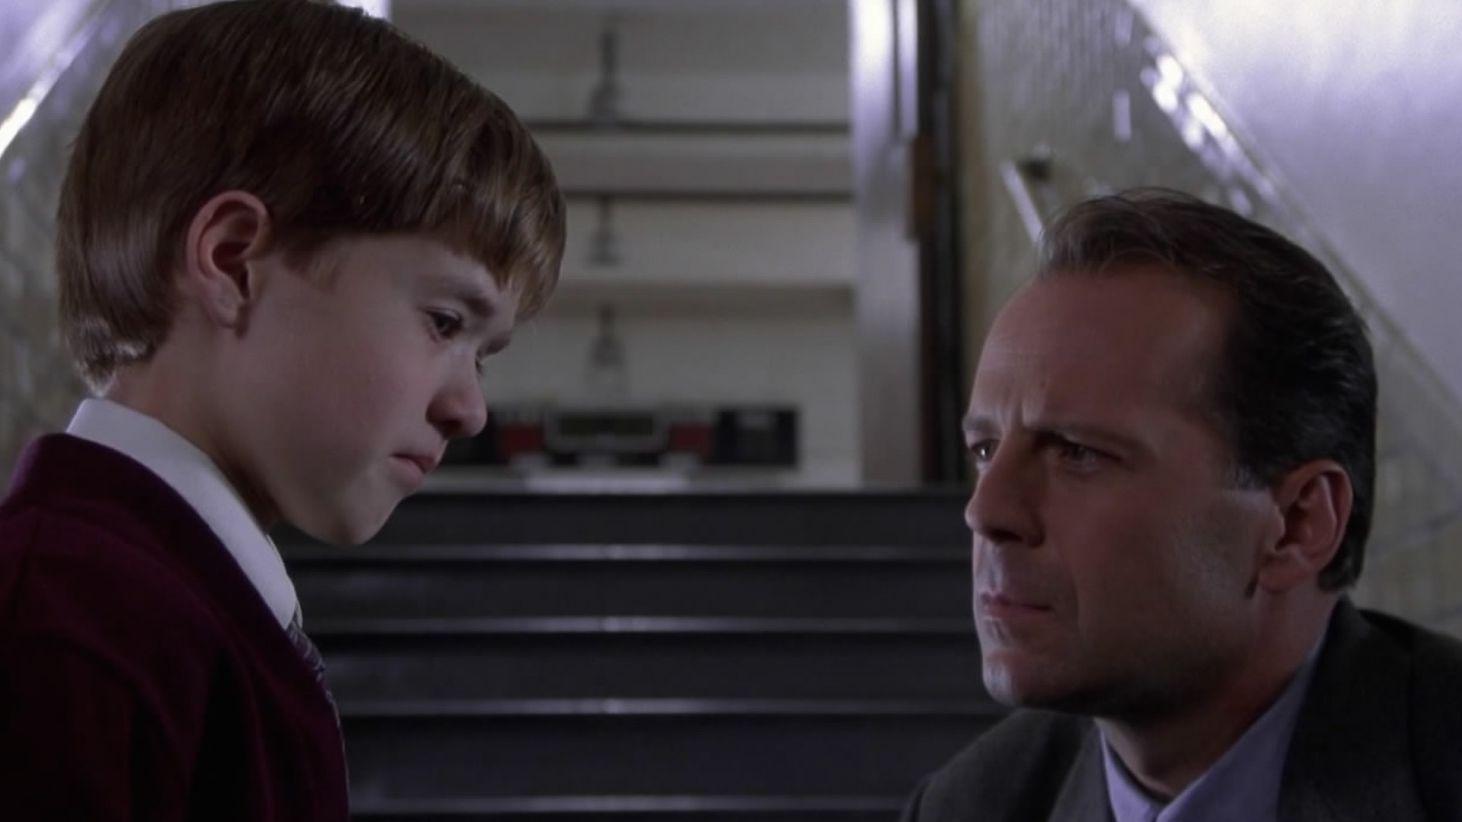 The Sixth Sense 1 - نقد فیلم The Sixth Sense (حس ششم)